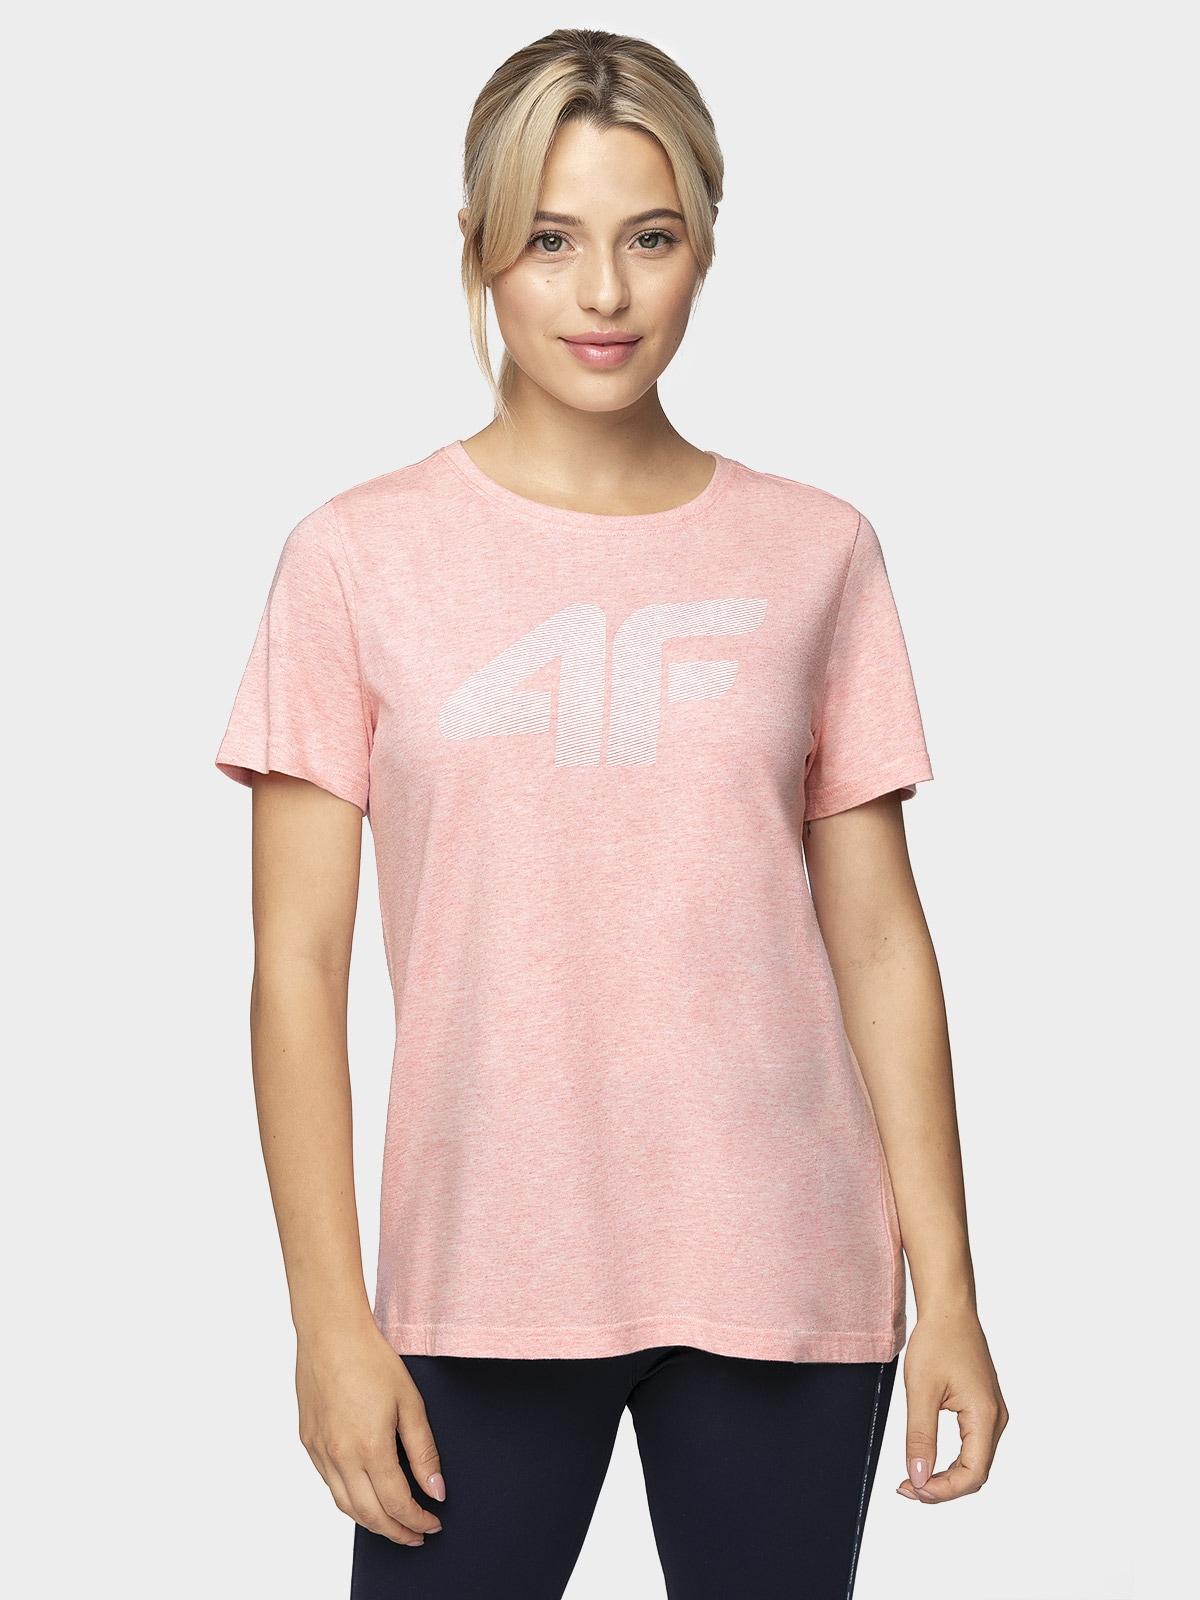 T-shirt damski TSD304 - jasny róż melanż